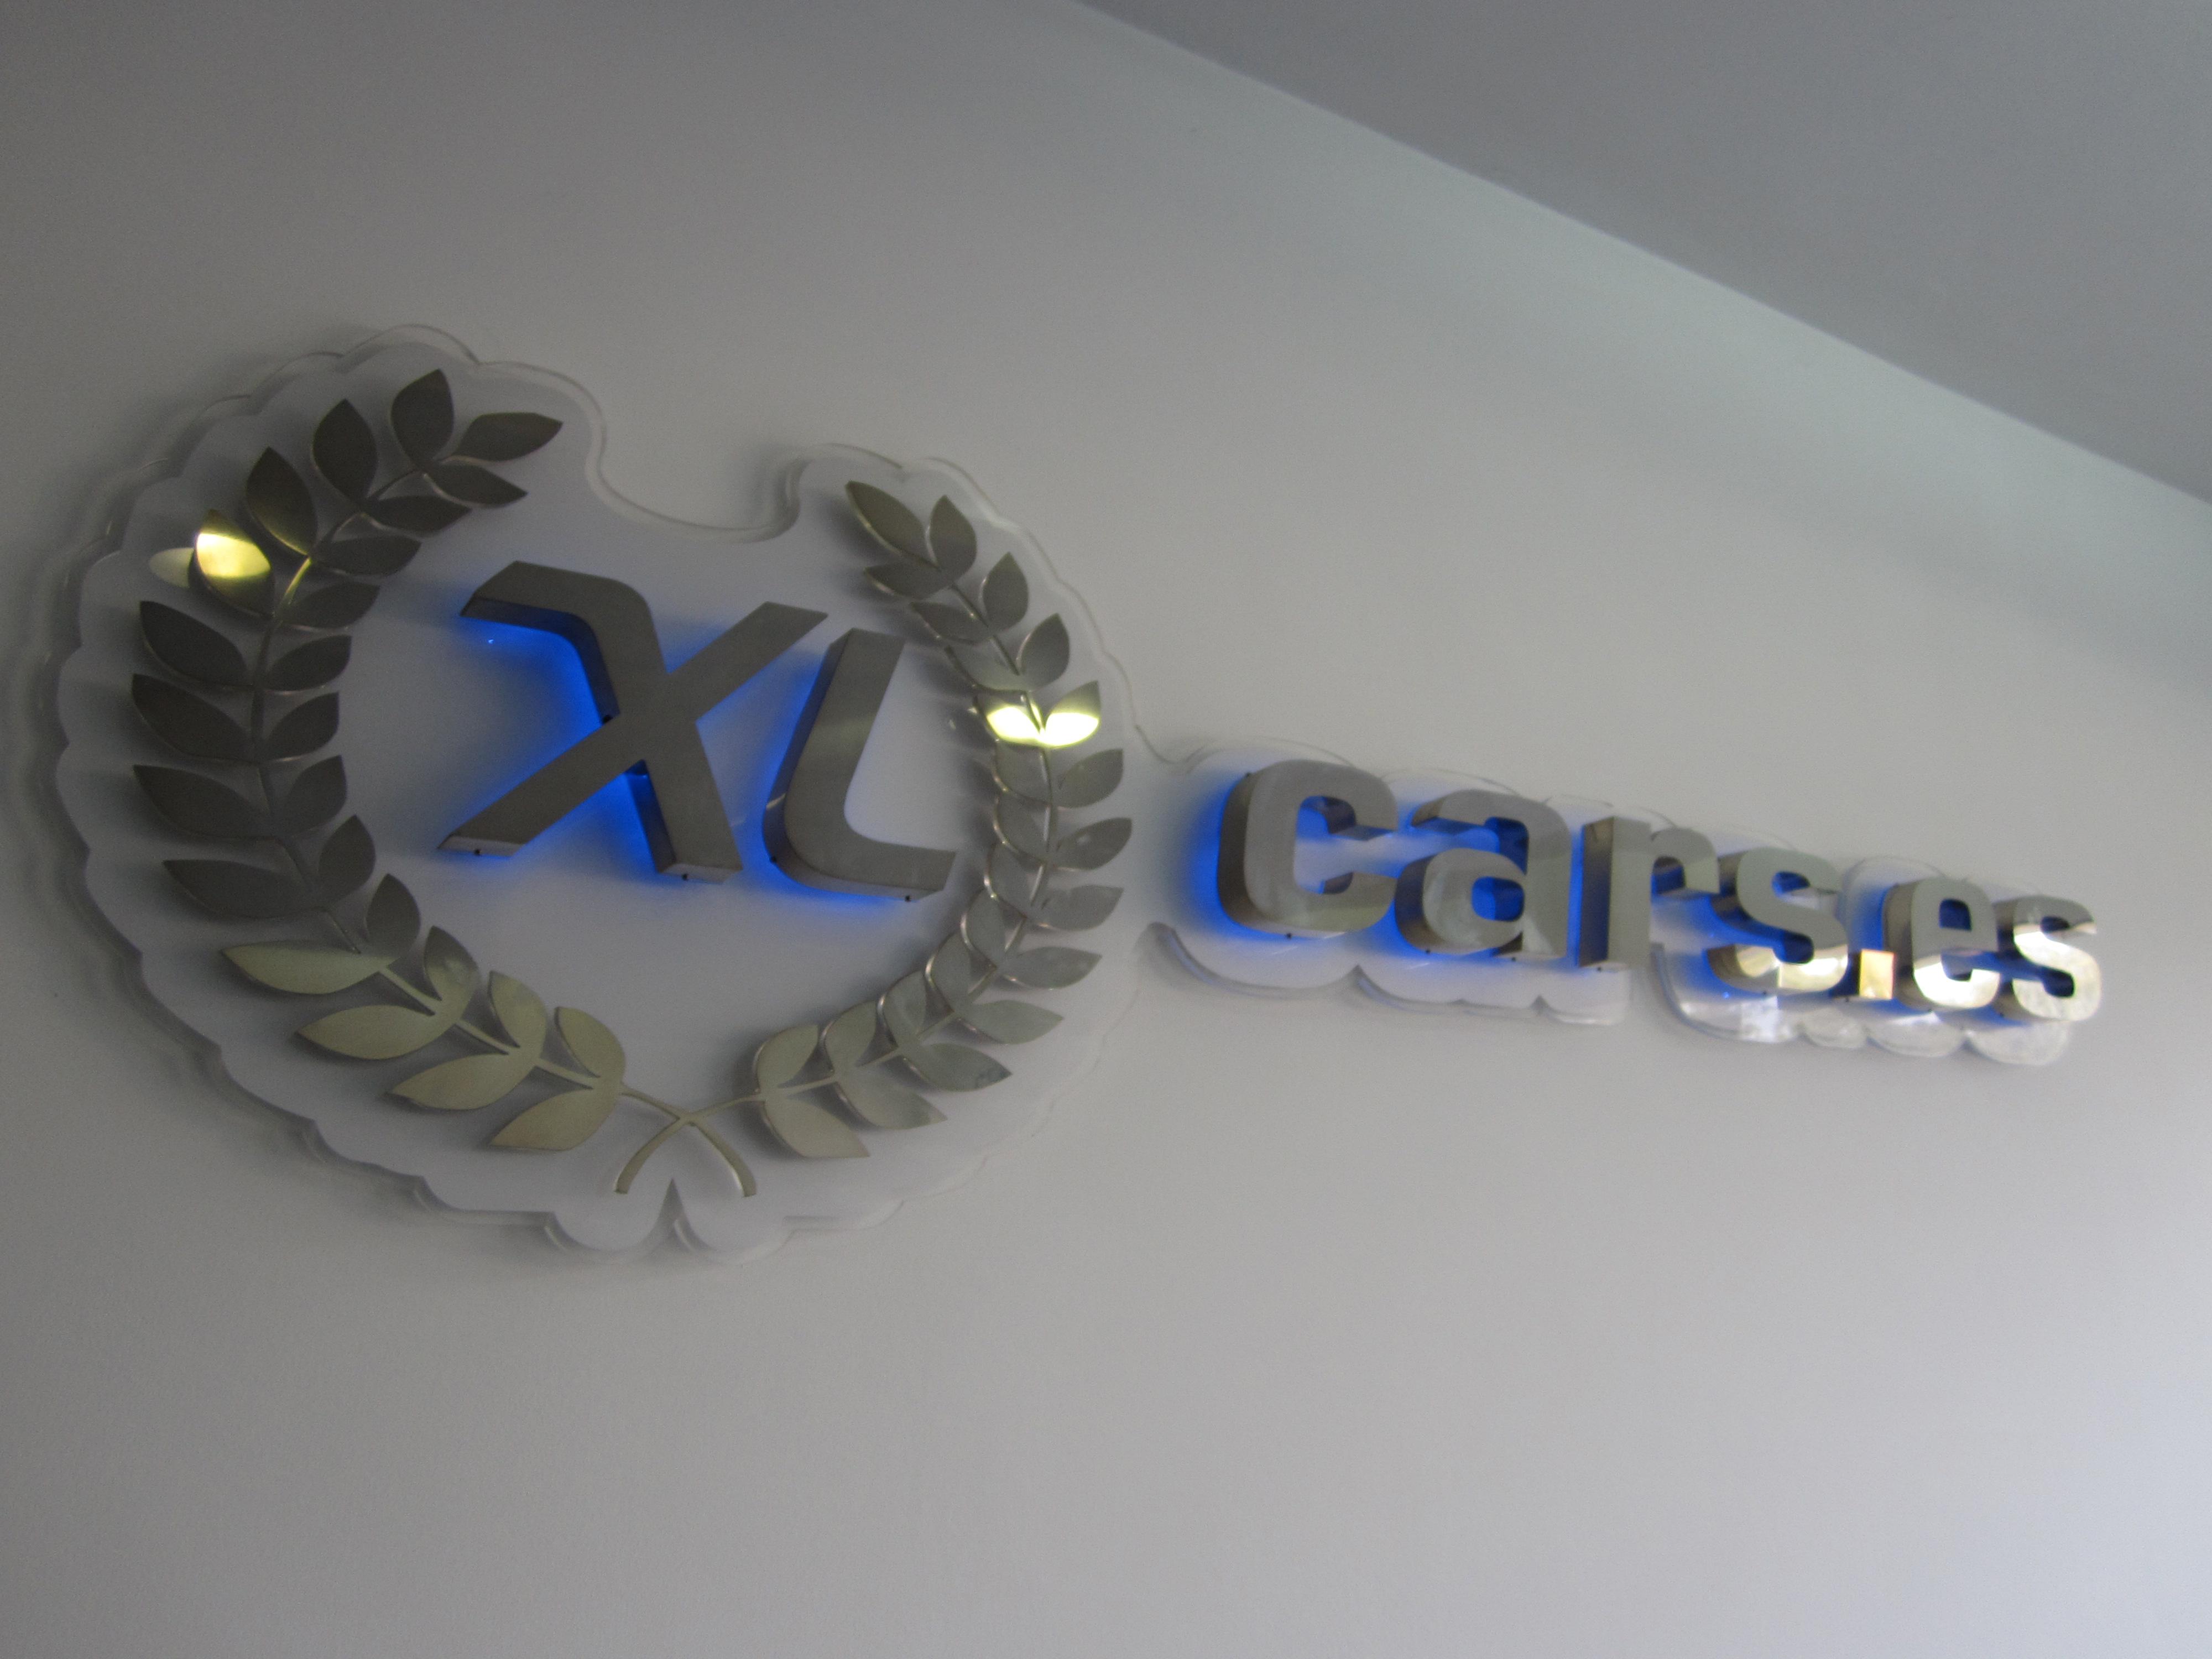 http://luzcoruna.es/wp-content/uploads/2020/03/IMG_0619-XL-Cars.jpg